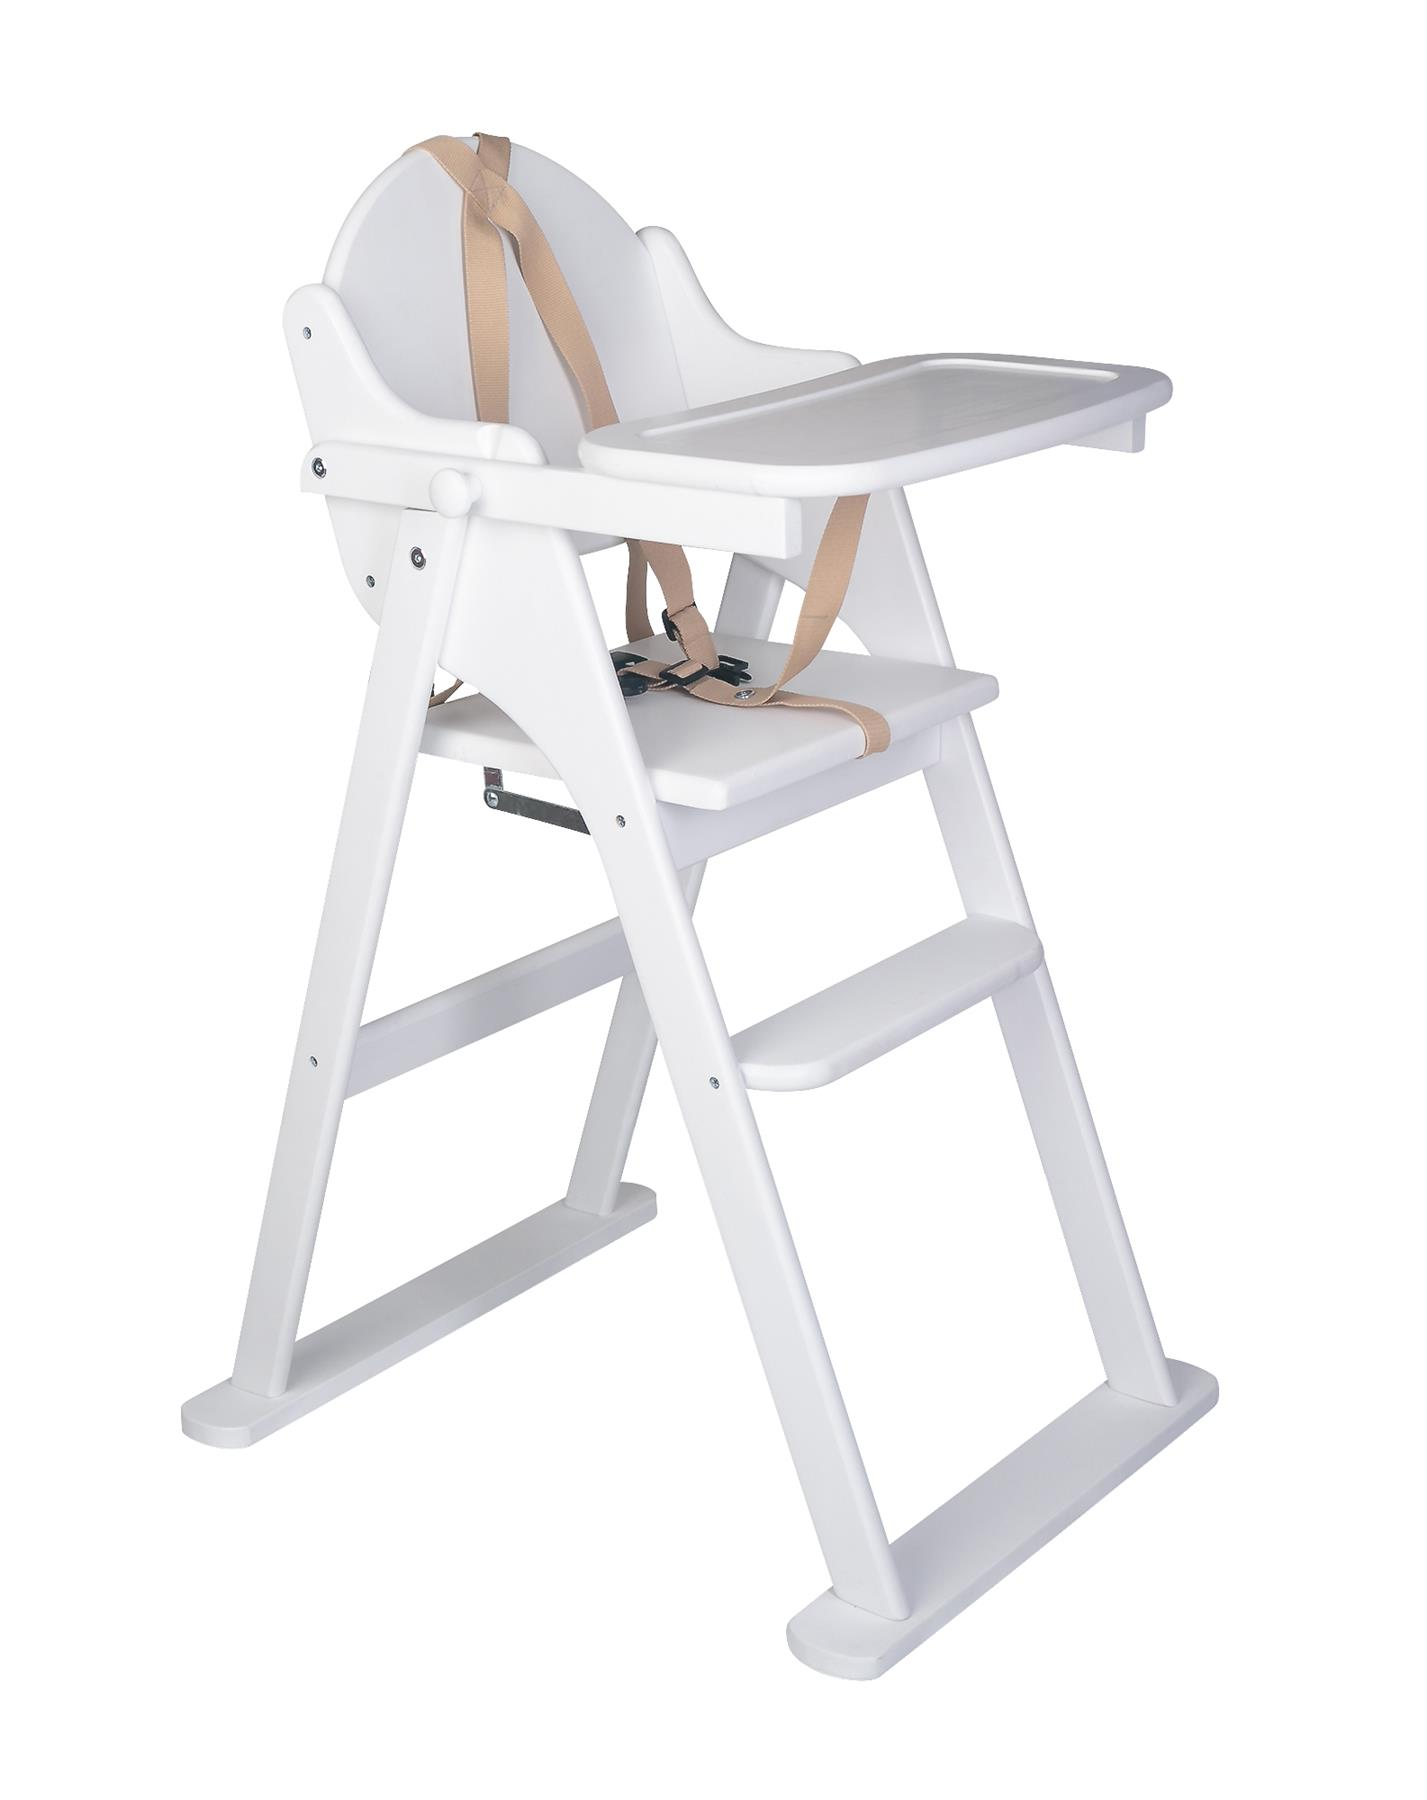 Safetots Folding Wooden Putaway High Chair Dark Wood